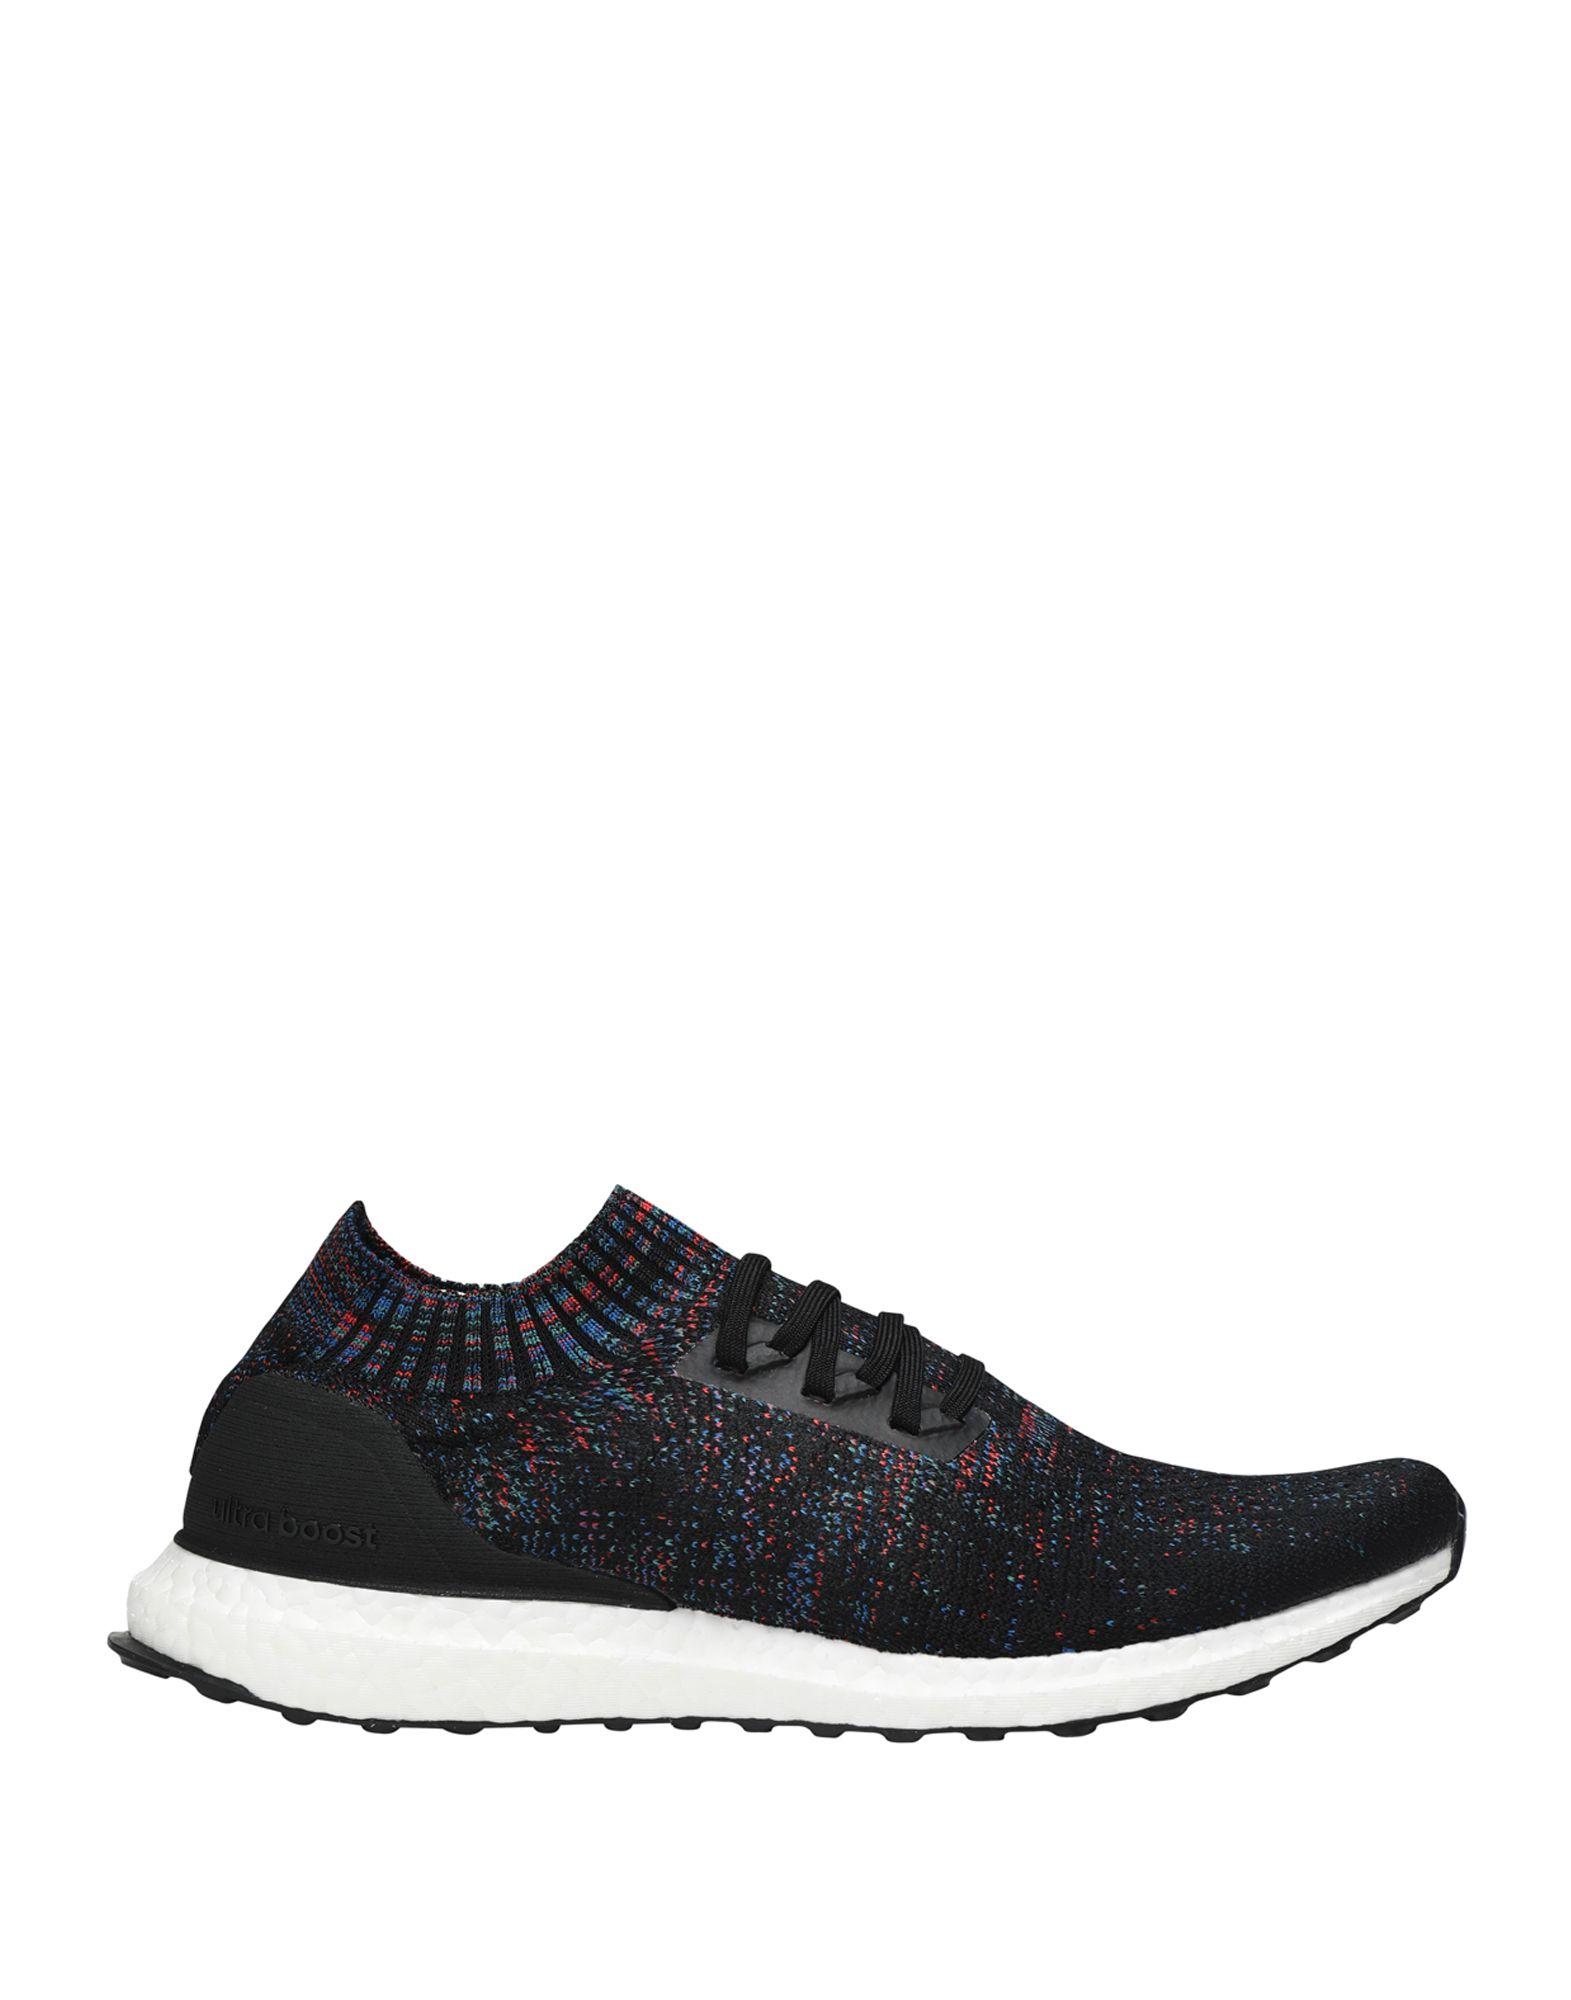 ADIDAS Низкие кеды и кроссовки adidas кроссовки дет спорт ultraboost j